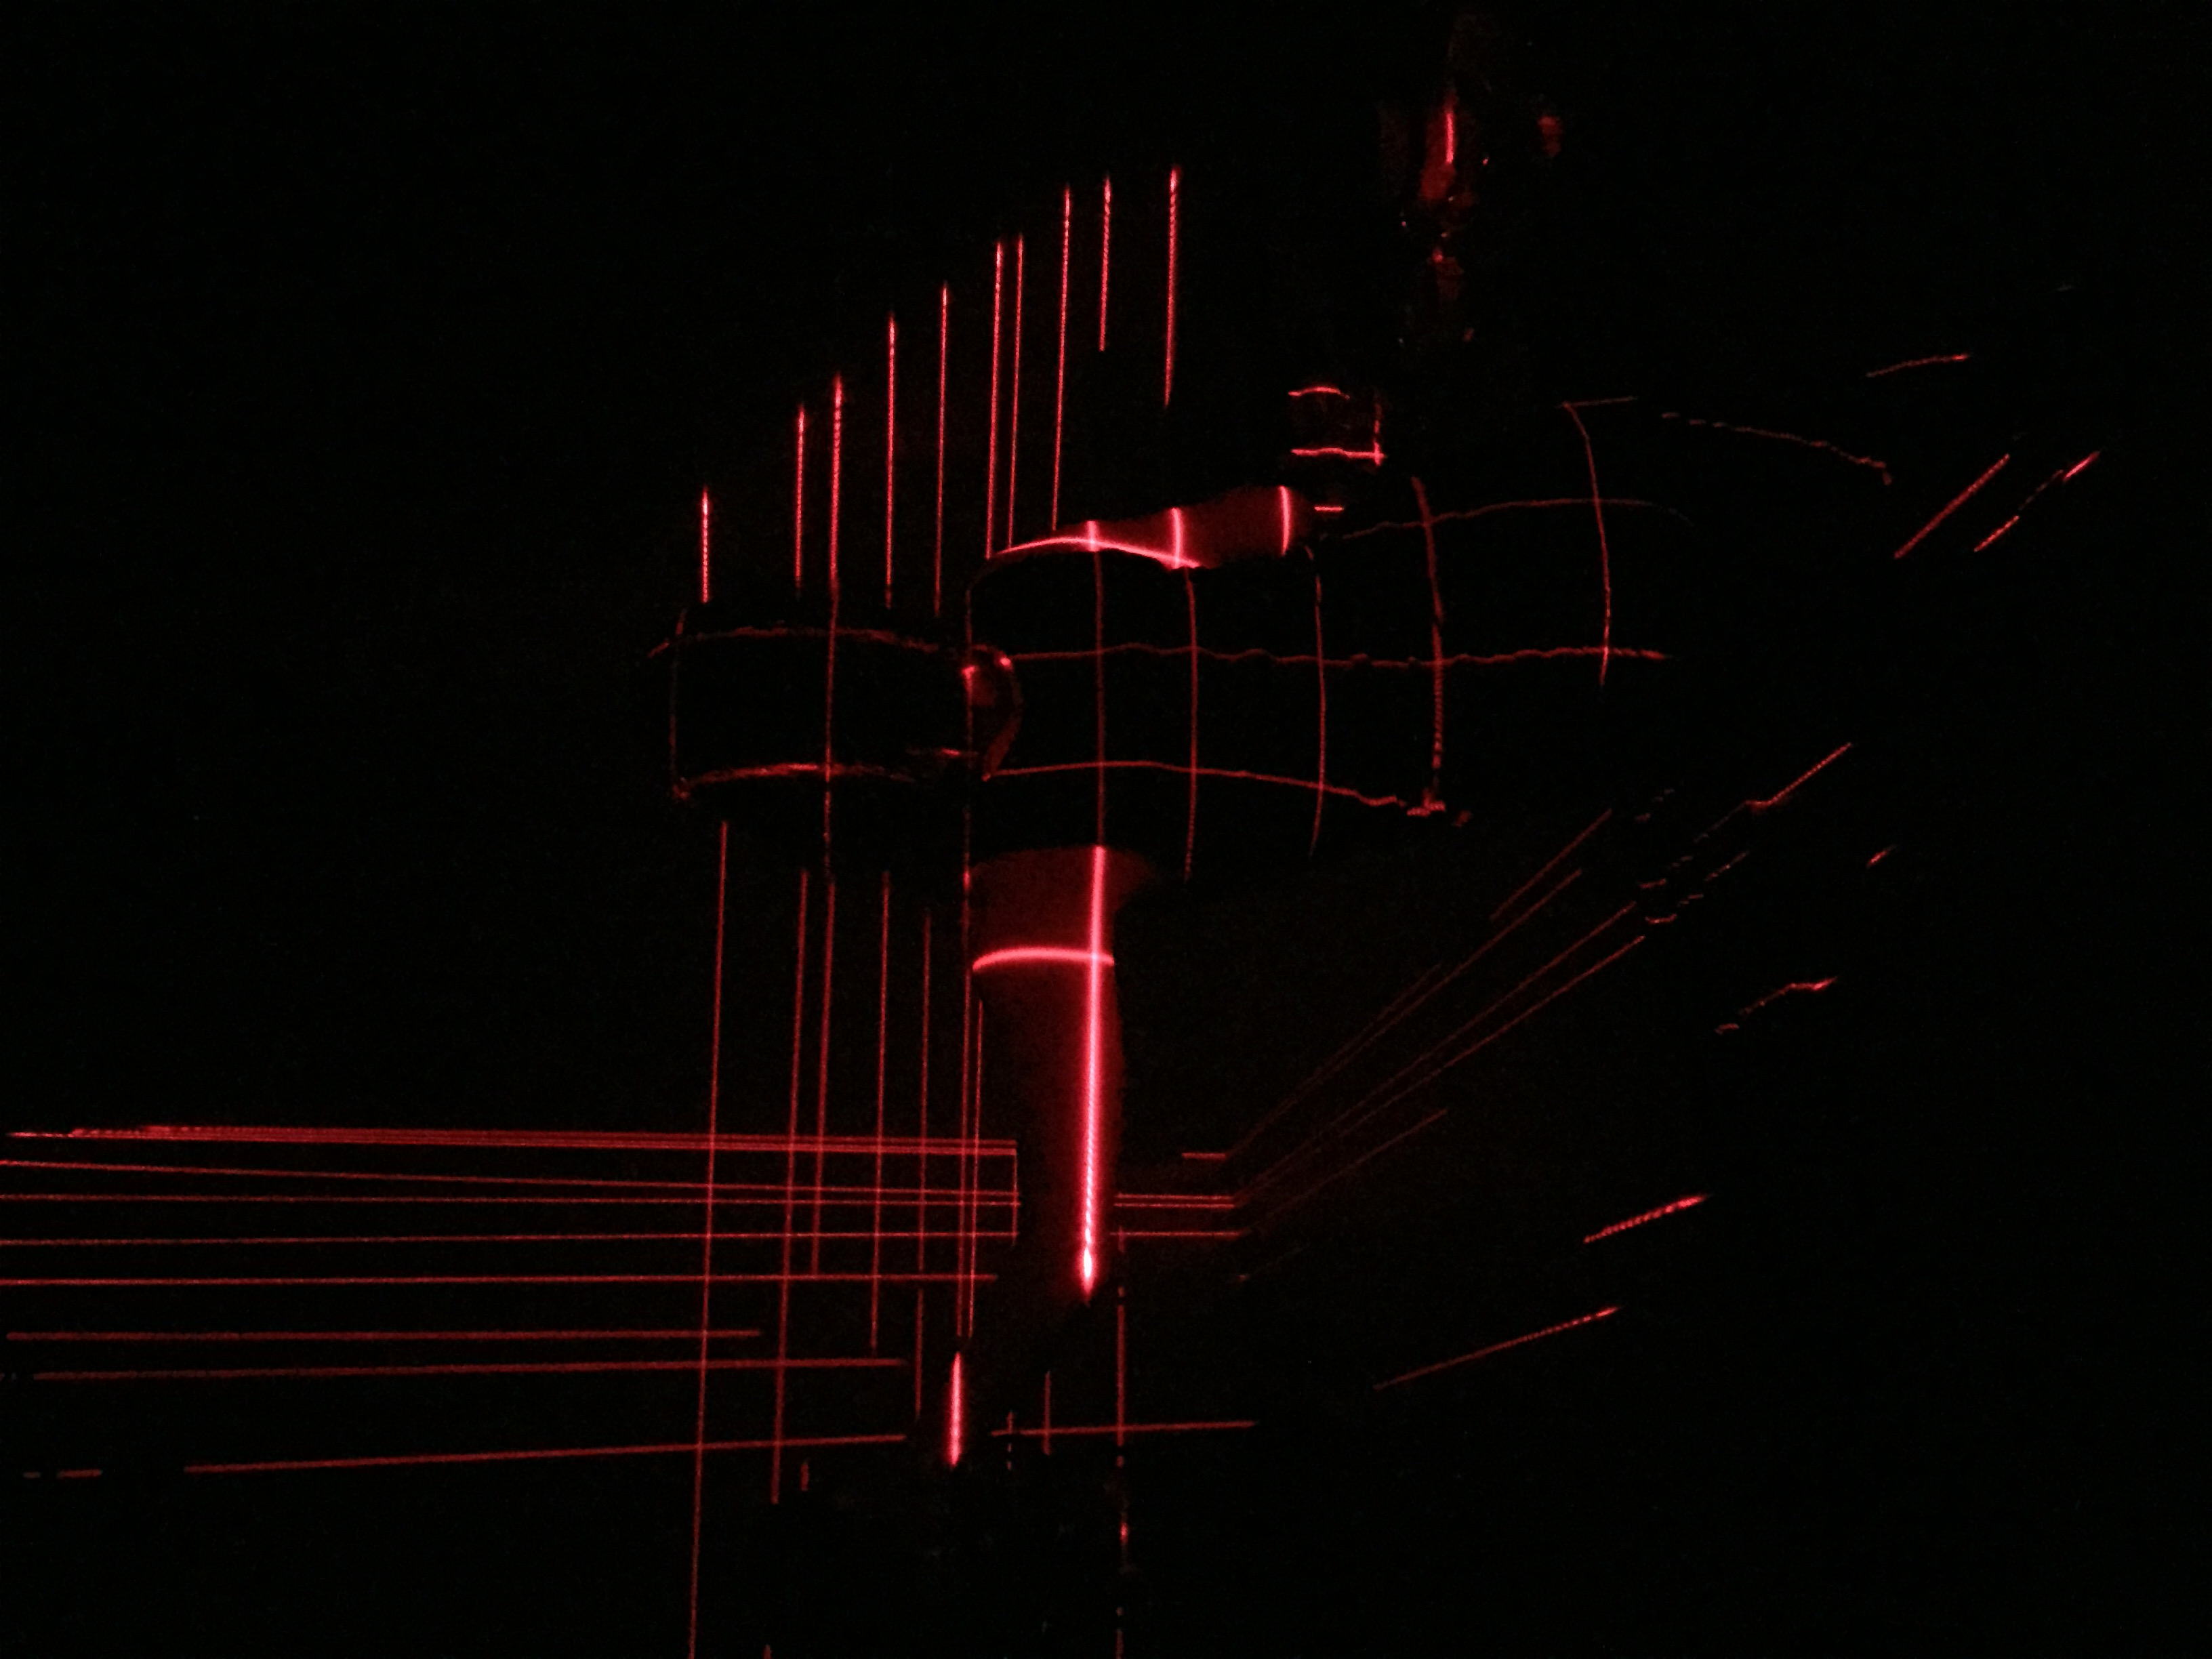 Lasermatrix-5